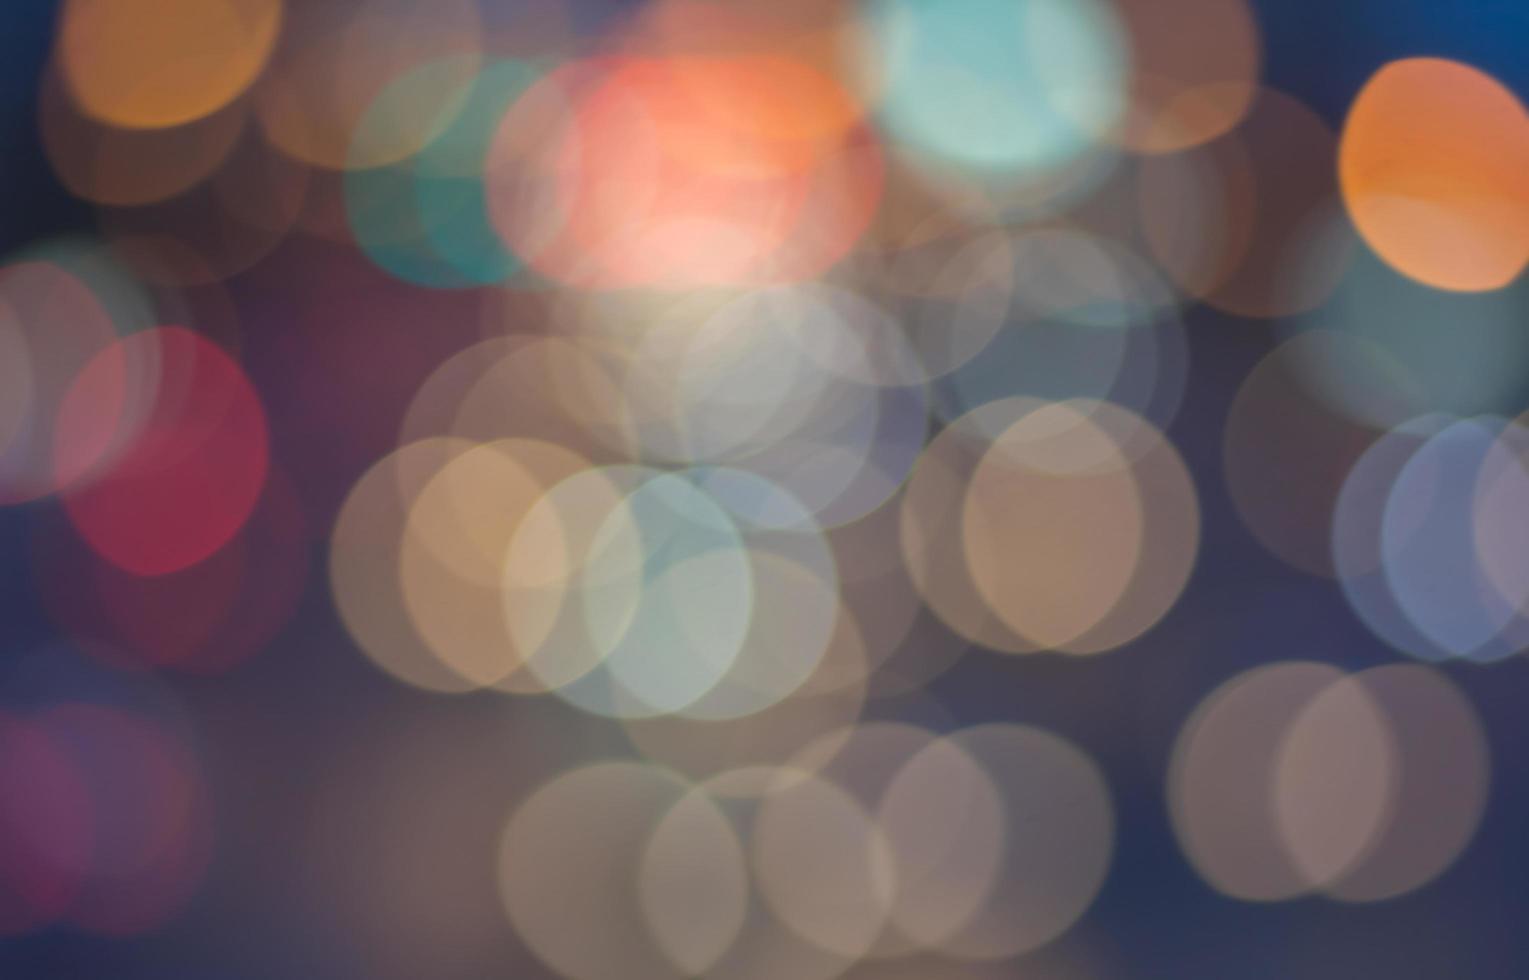 Abstract bokeh lights photo